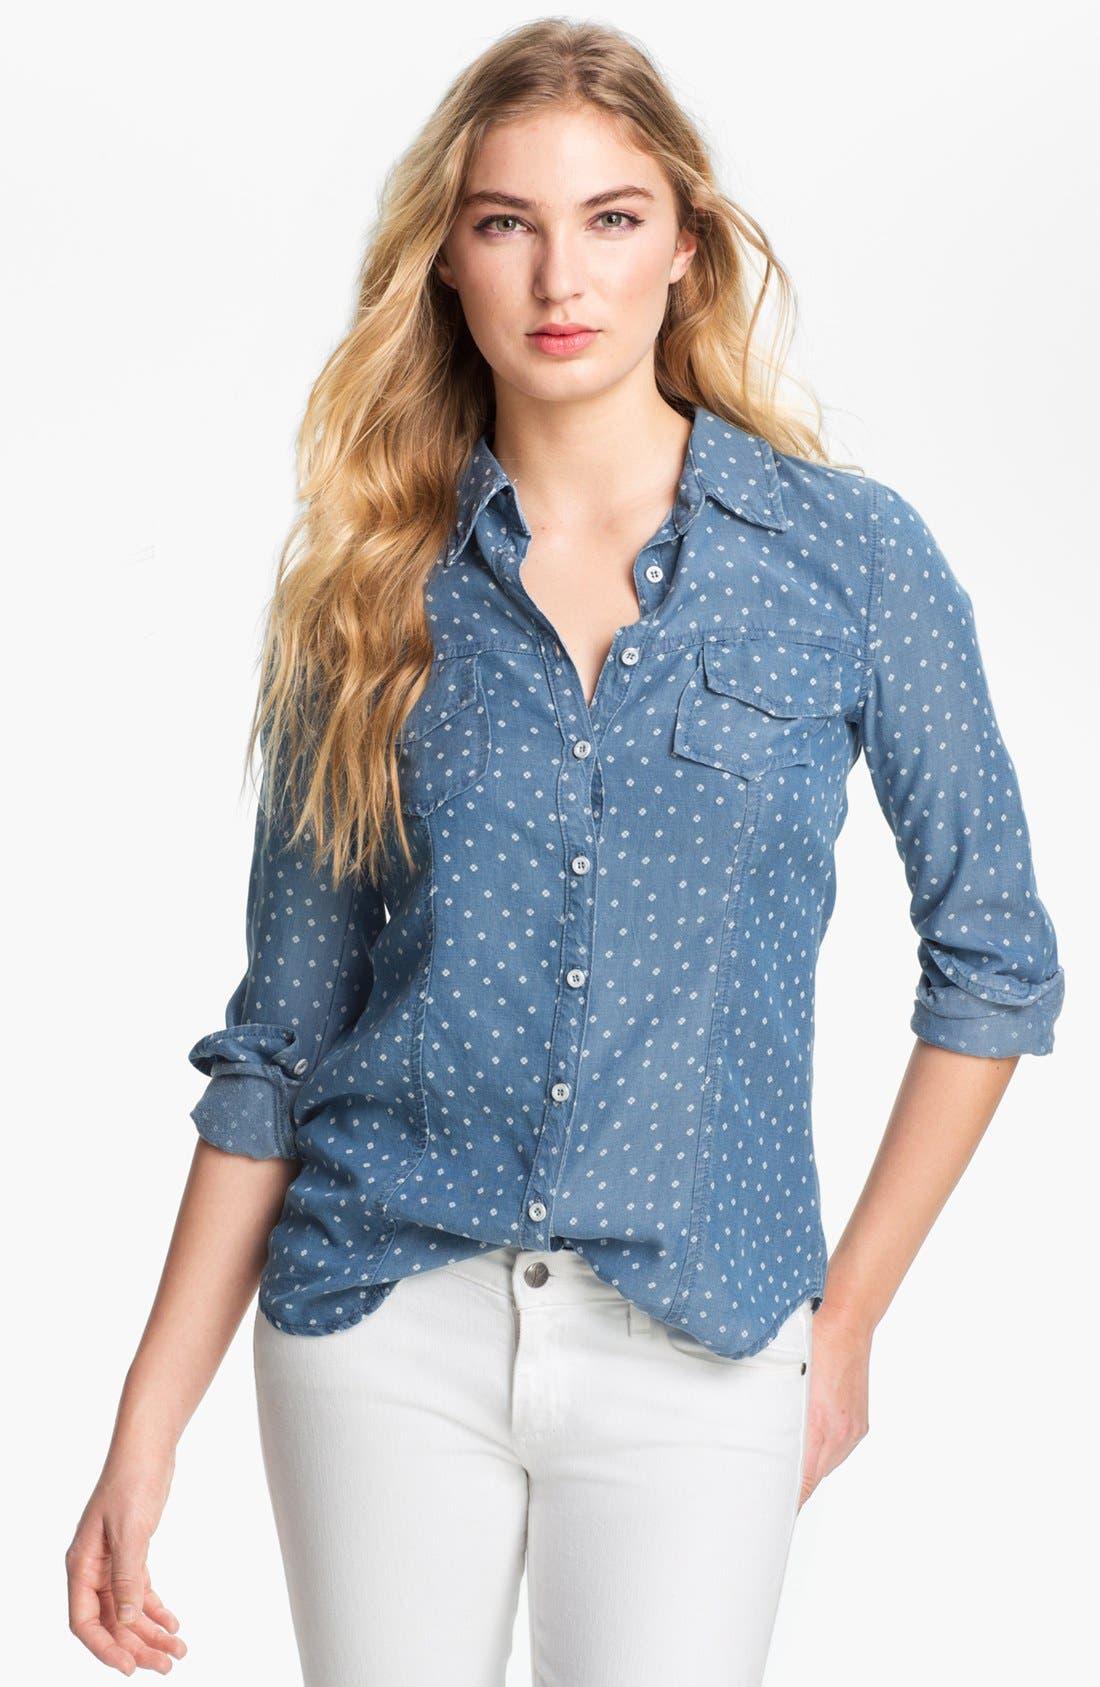 Alternate Image 1 Selected - Splendid Ditsy Print Chambray Shirt